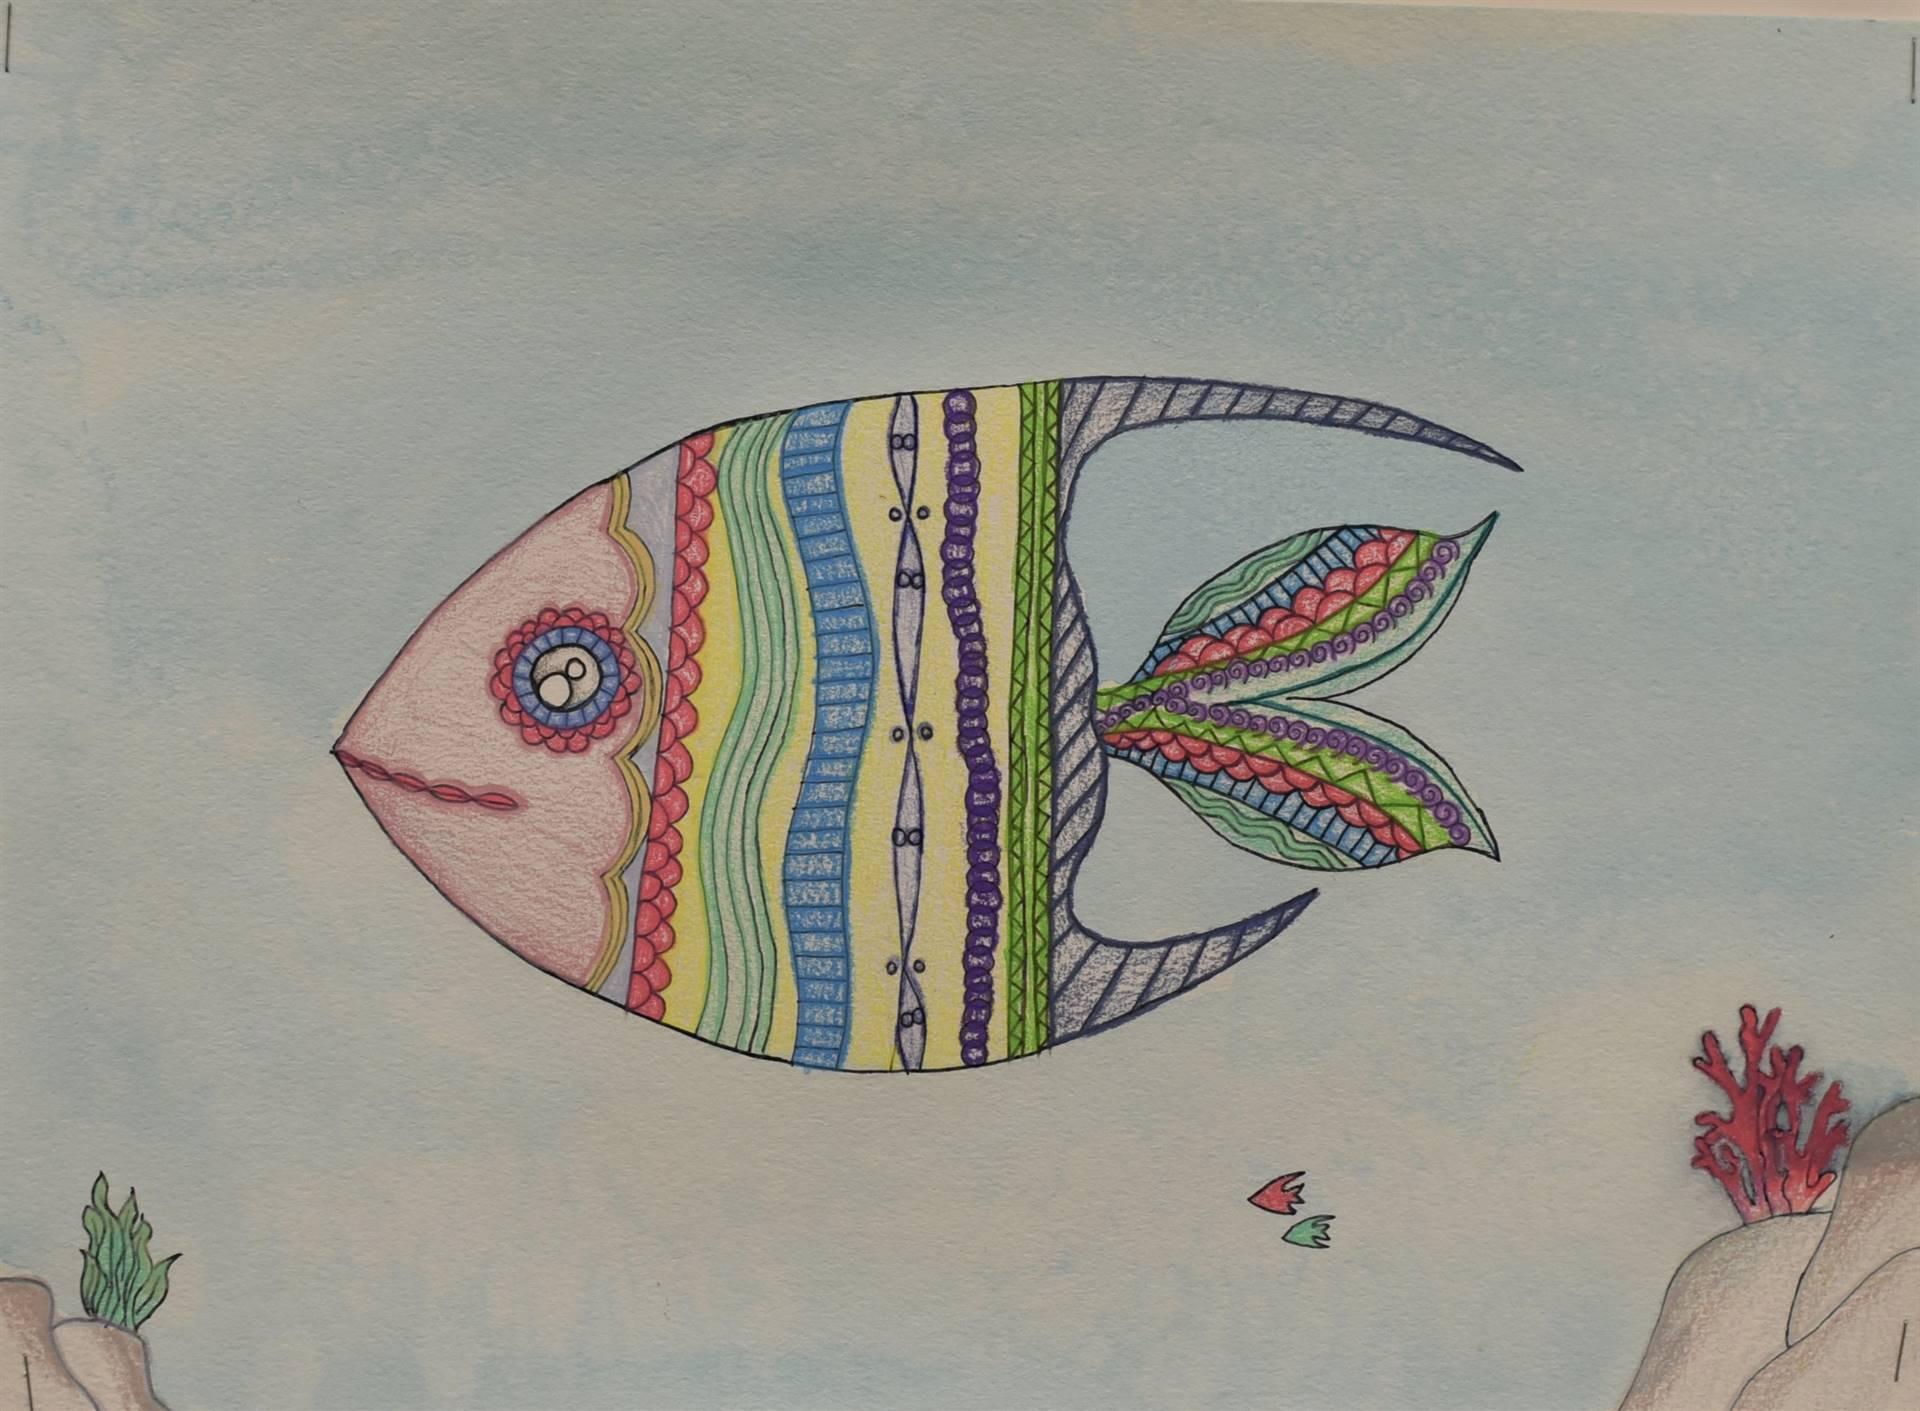 Brecksville-Broadview Hts. Middle School Art Projects 146